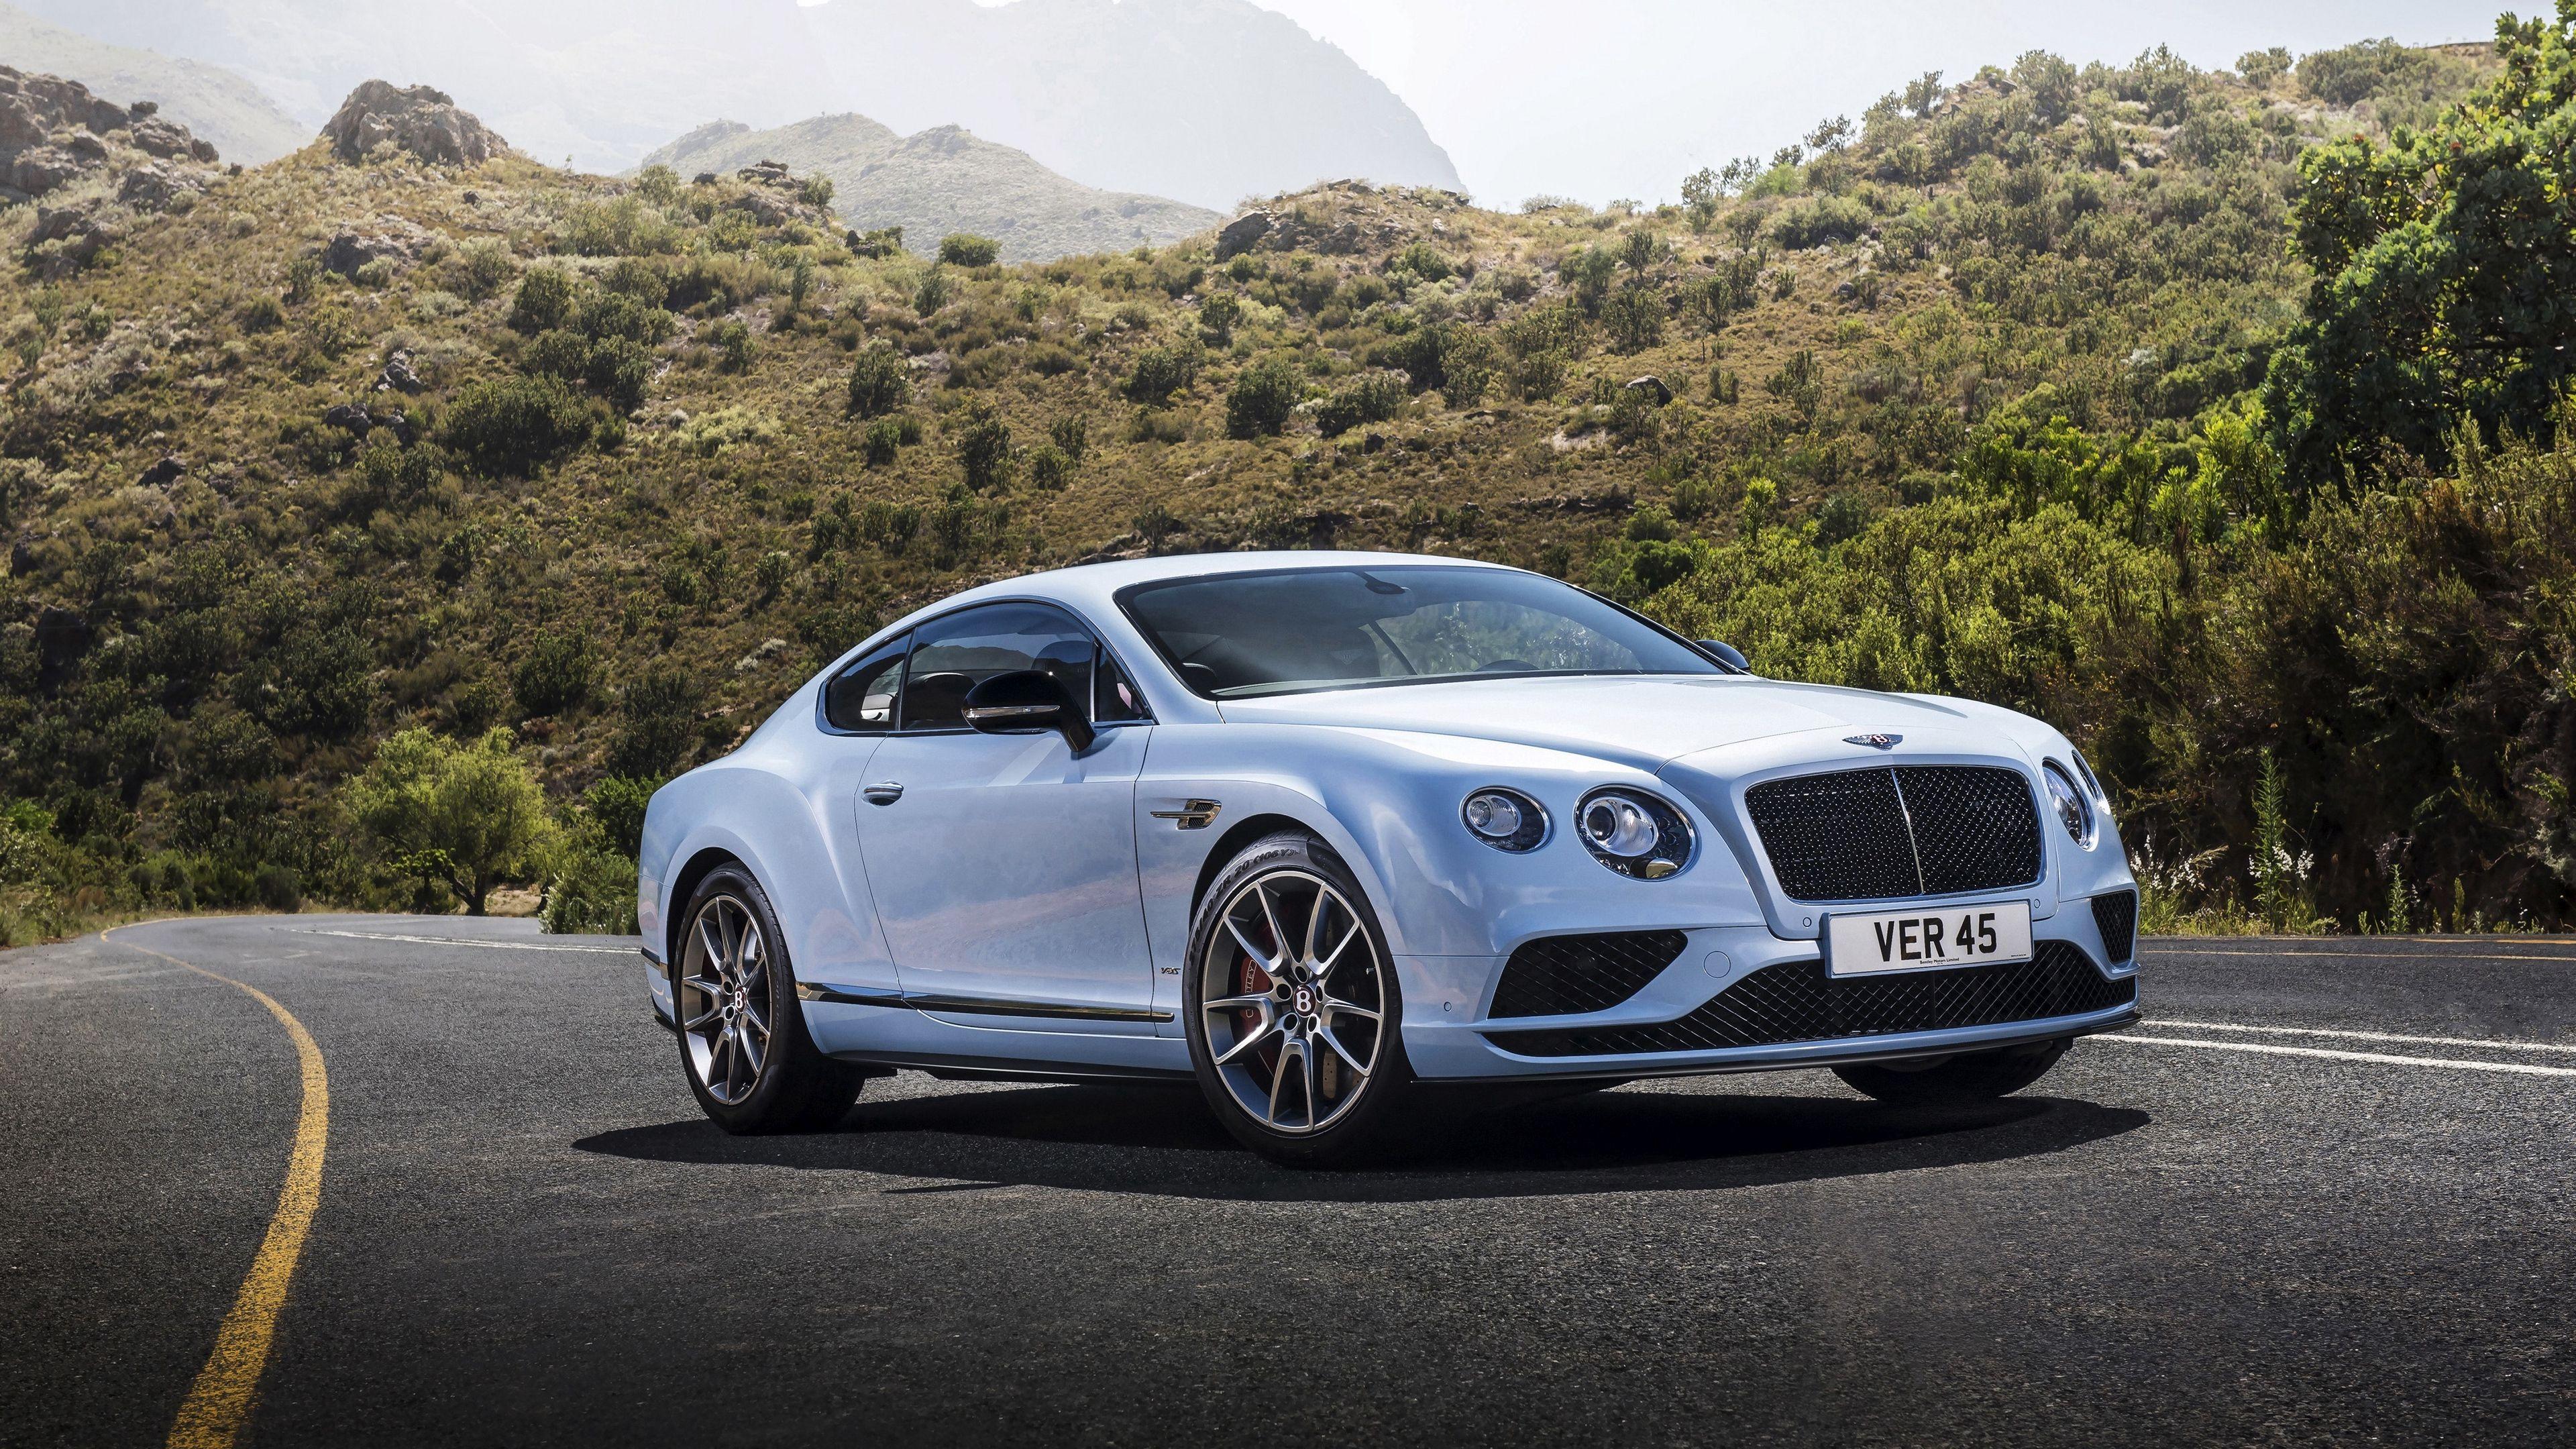 Wallpaper 4k Bentley Continental Gt White Side View Road 4k